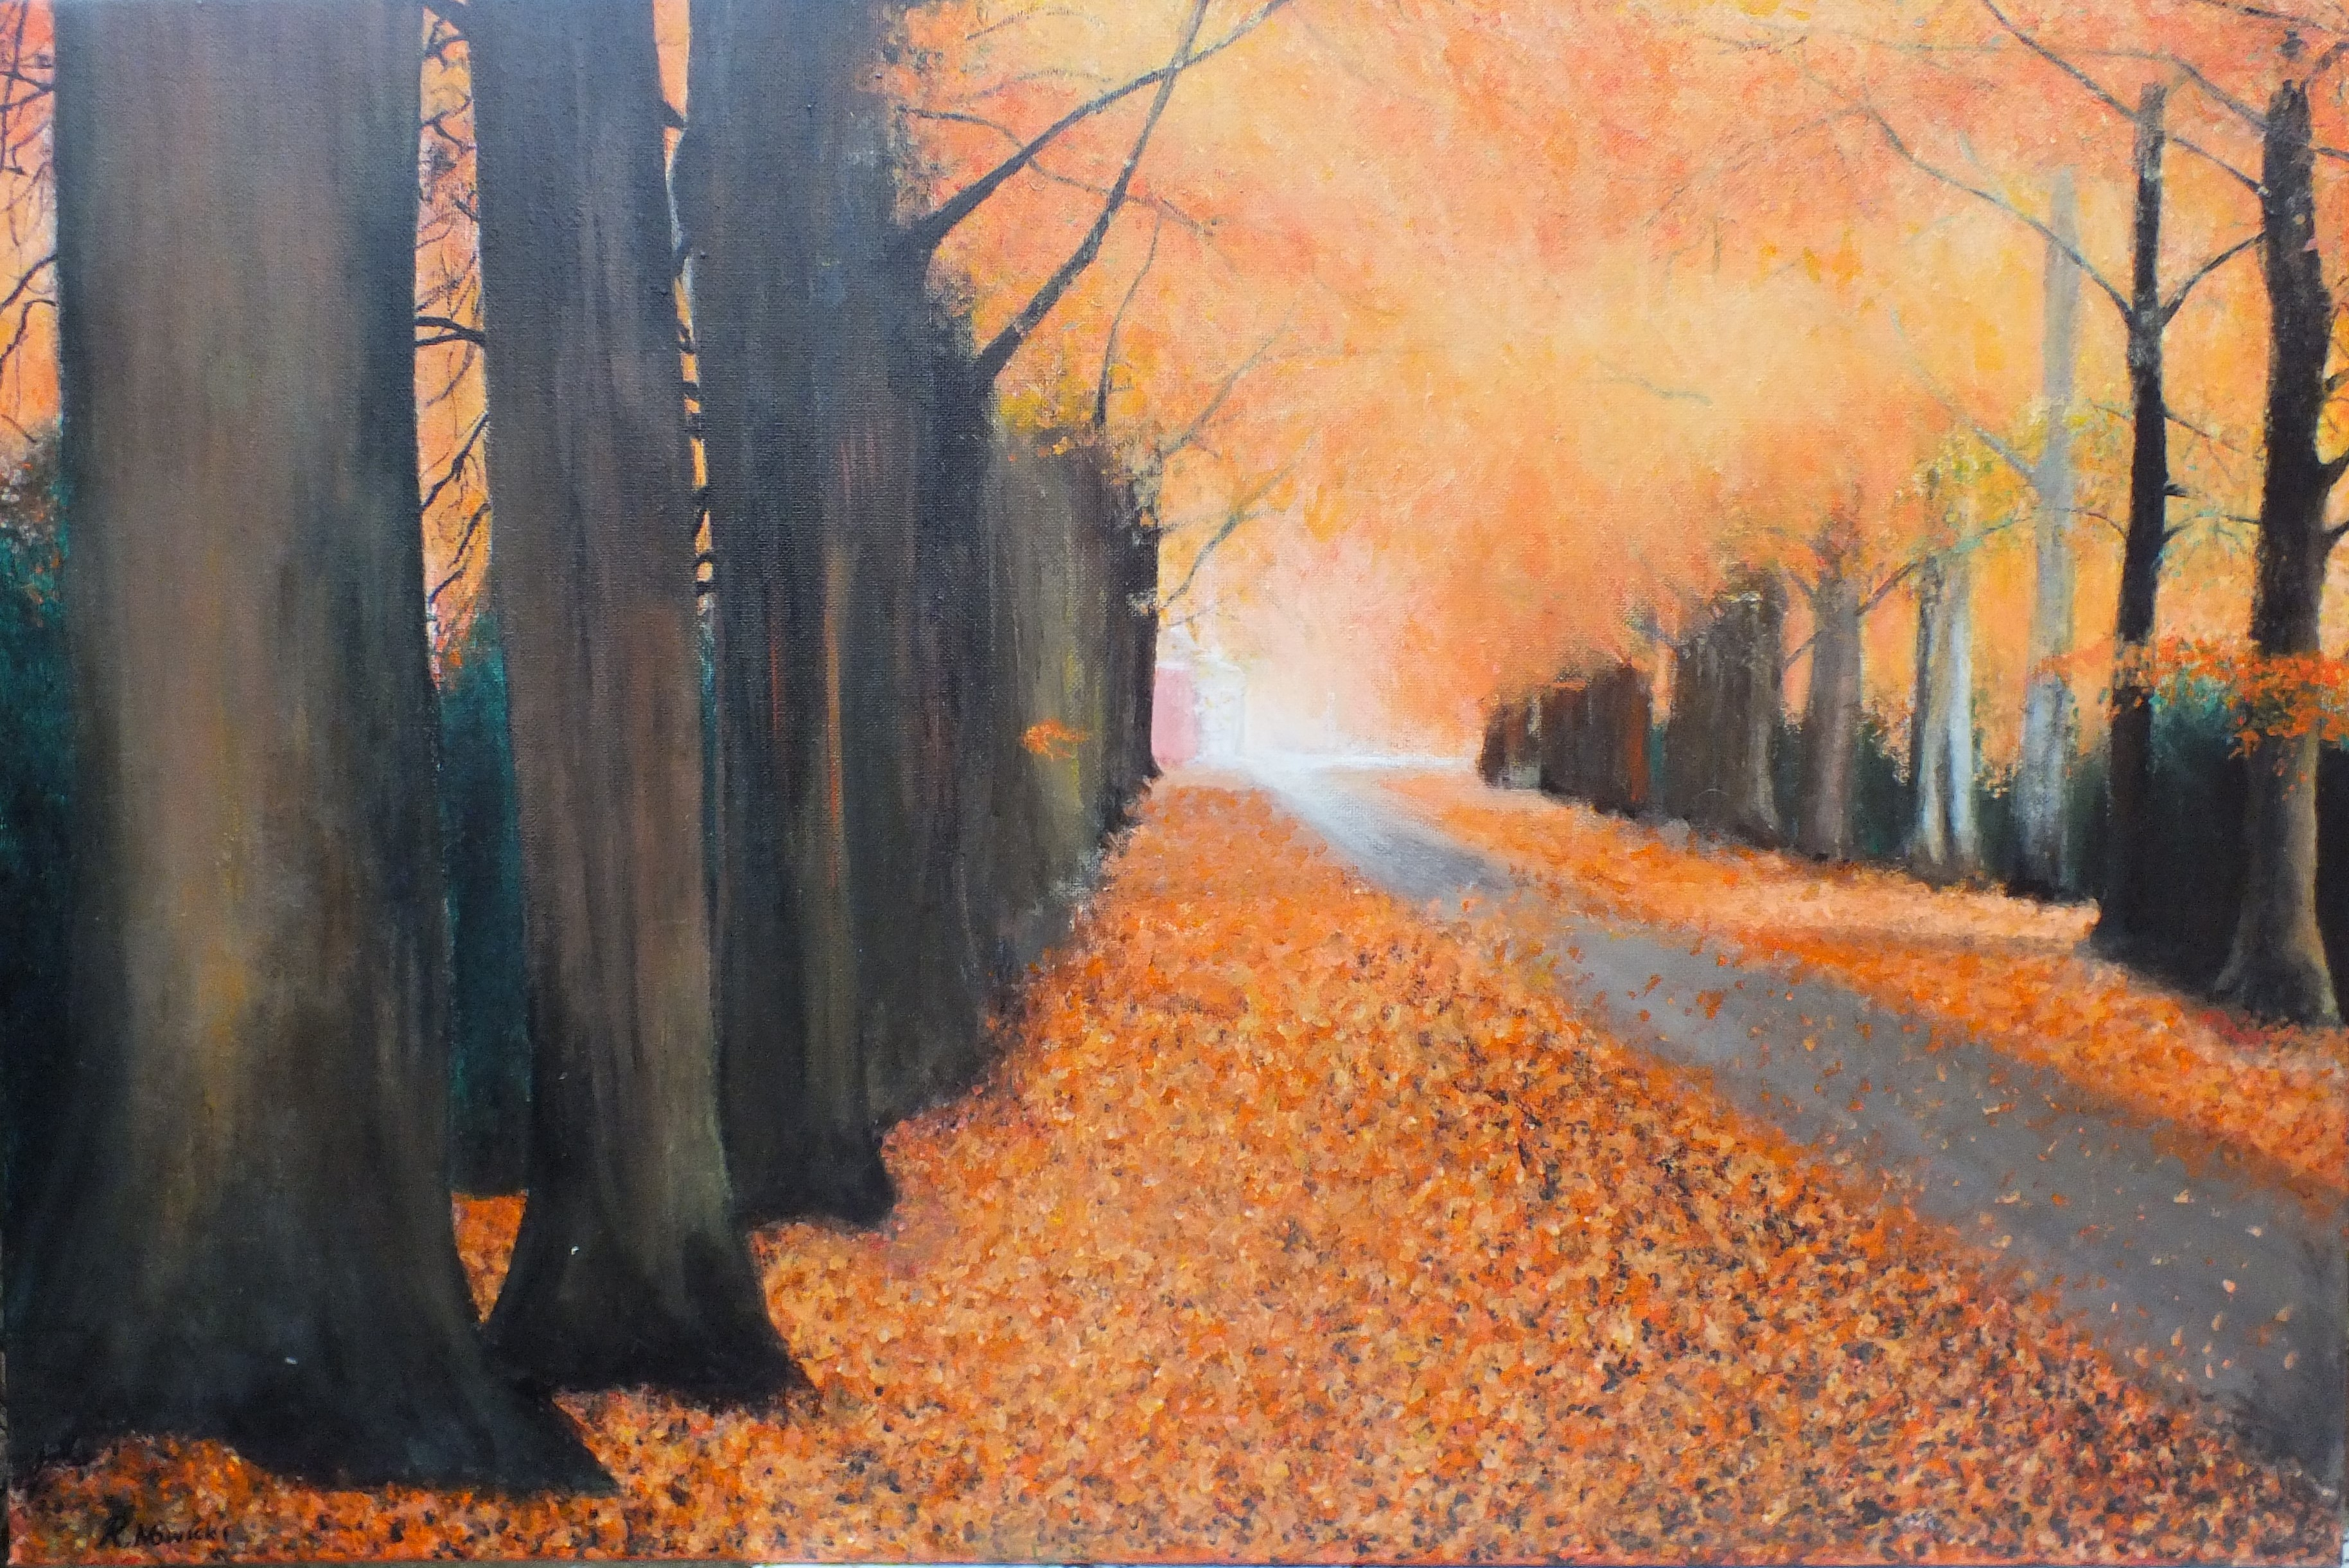 Forest acrylic on canvas